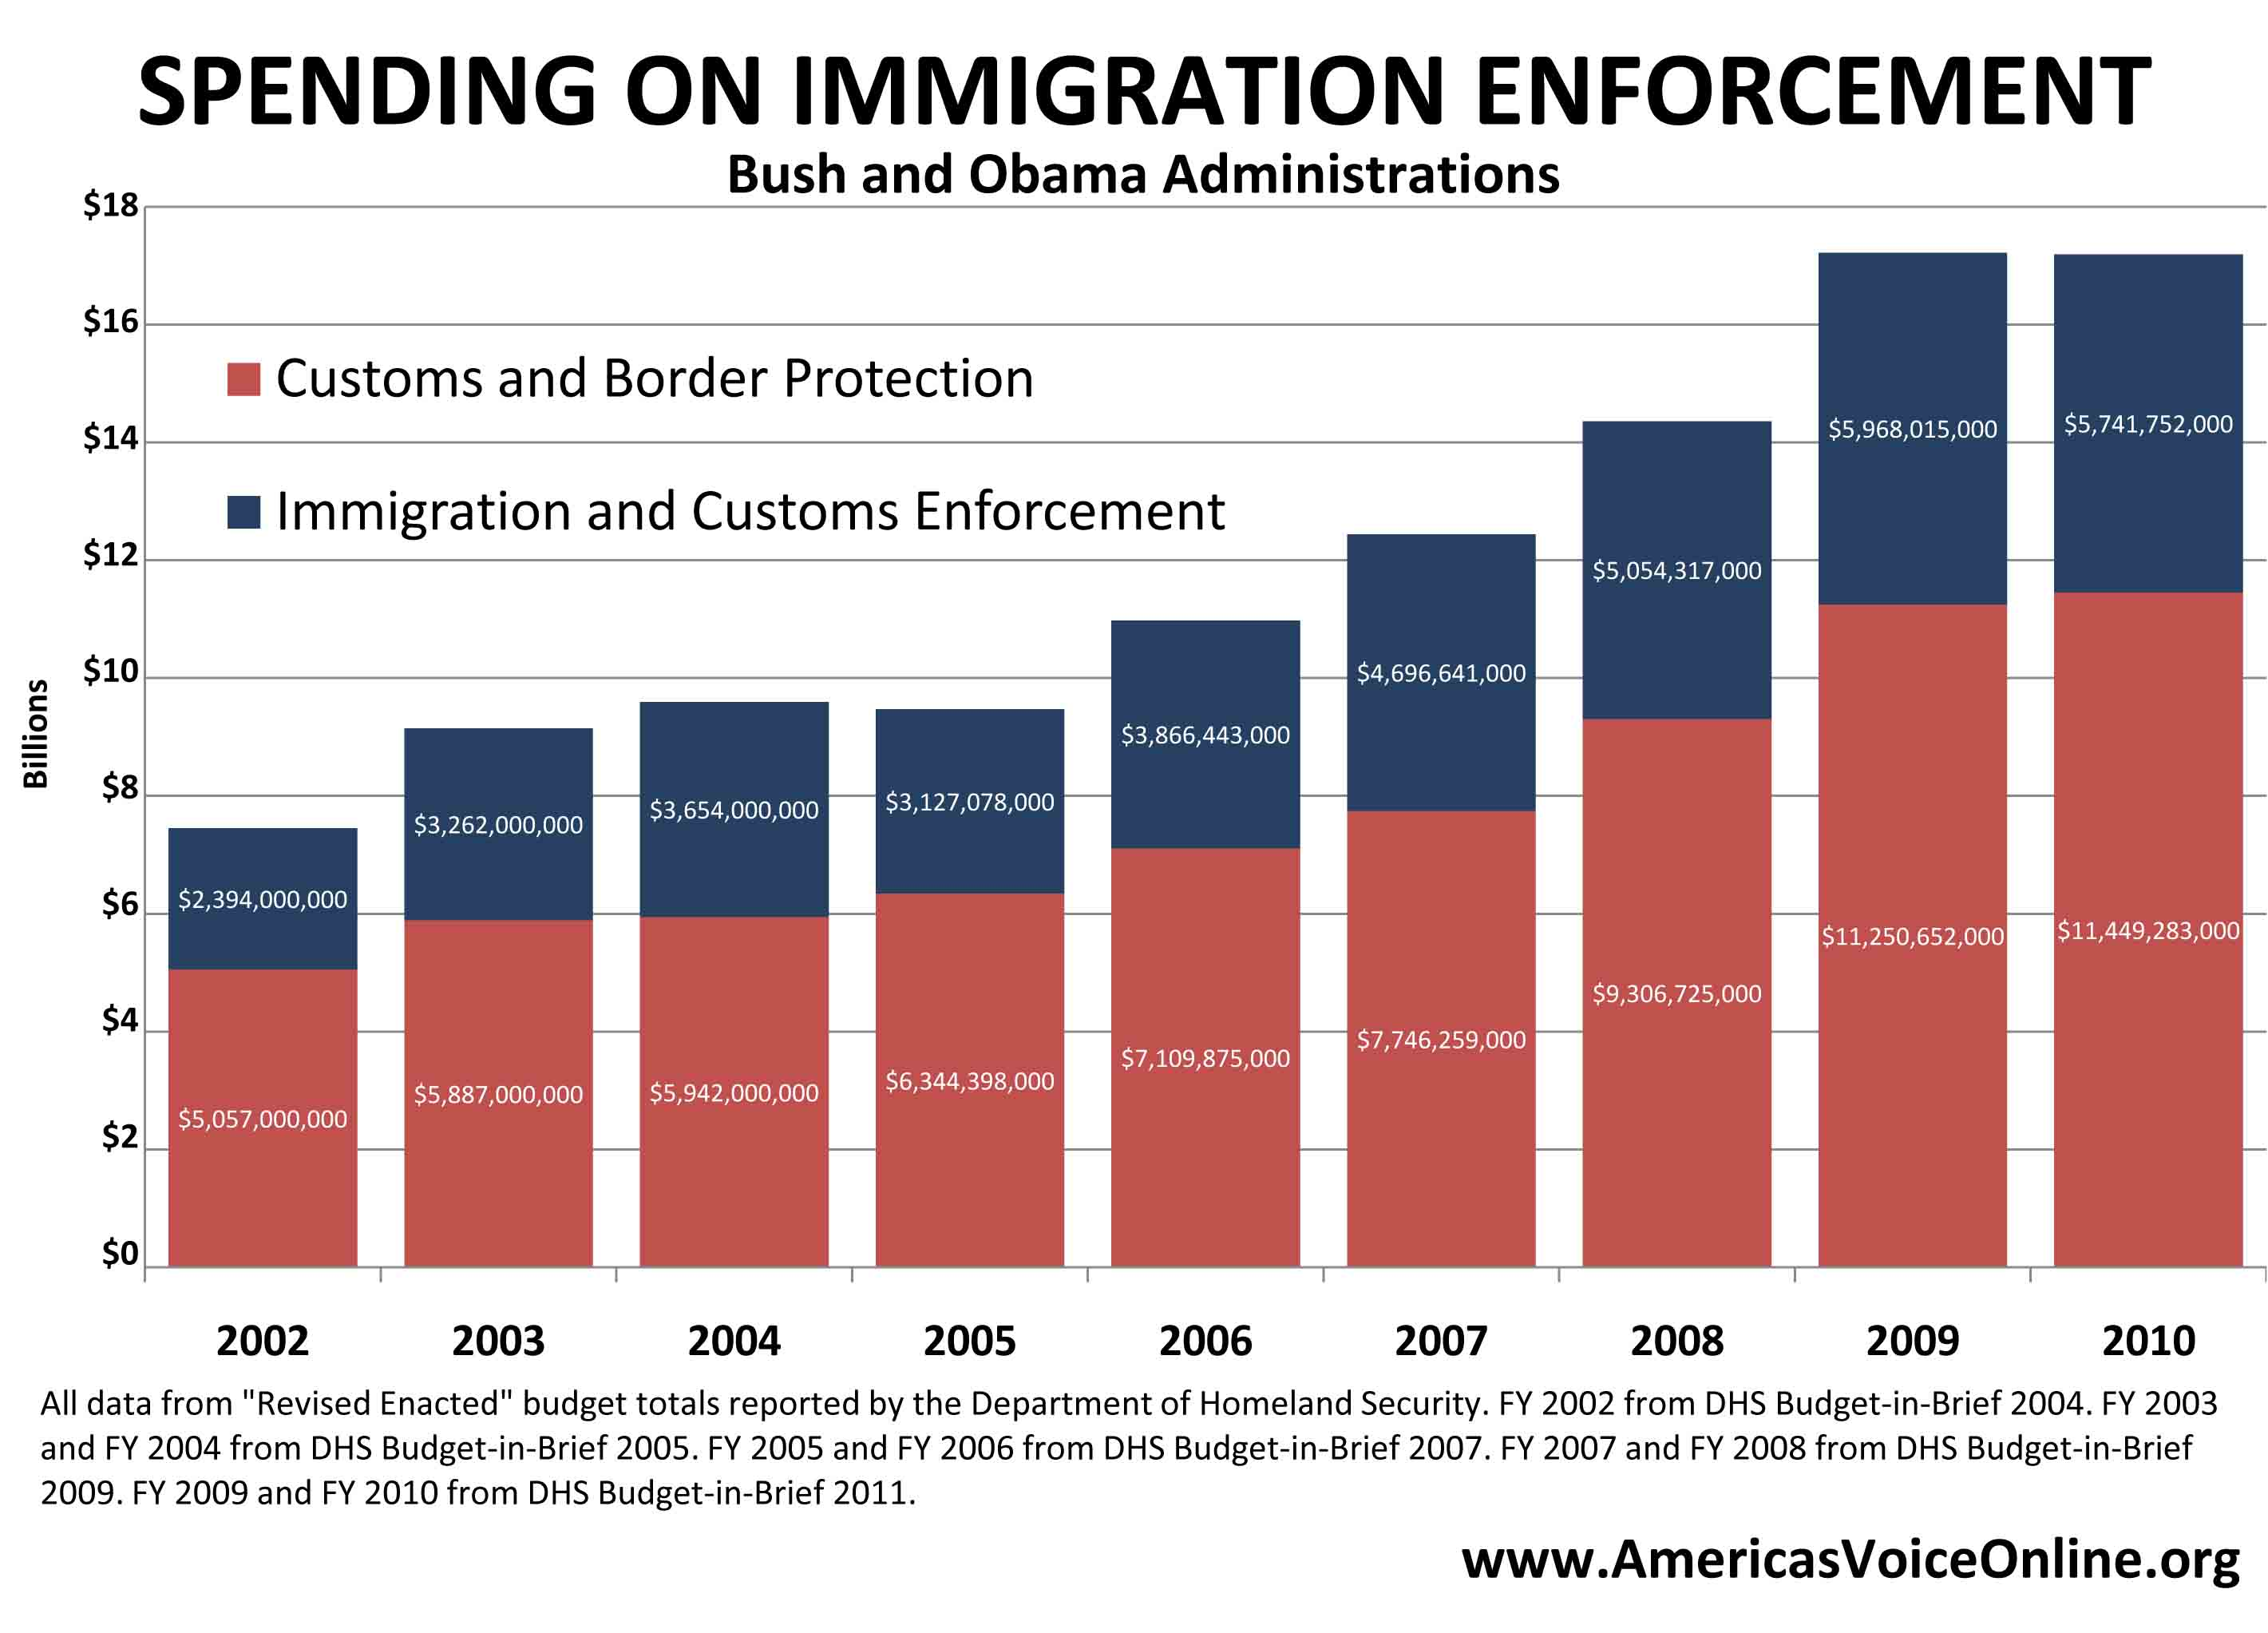 Spending on Immigration Enforcement